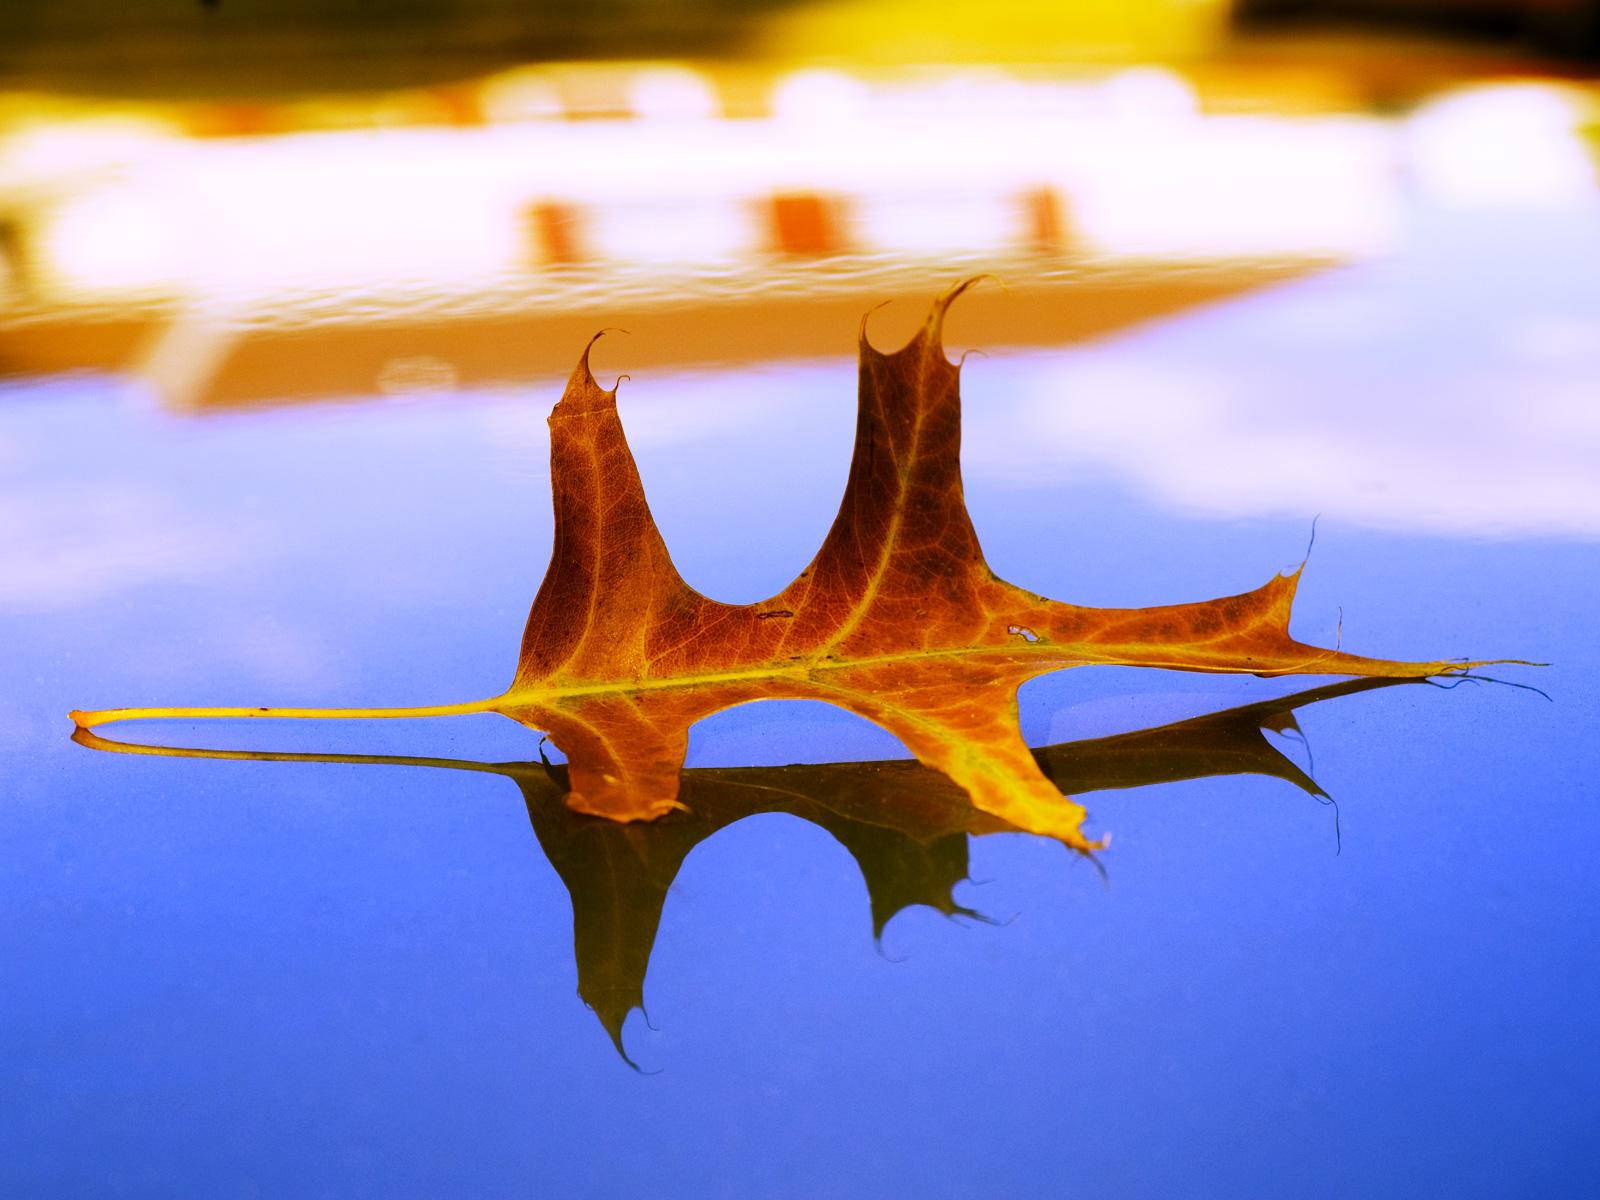 The best top autumn desktop wallpapers 14 En Güzel Sonbahar HD Duvar Kağıtları